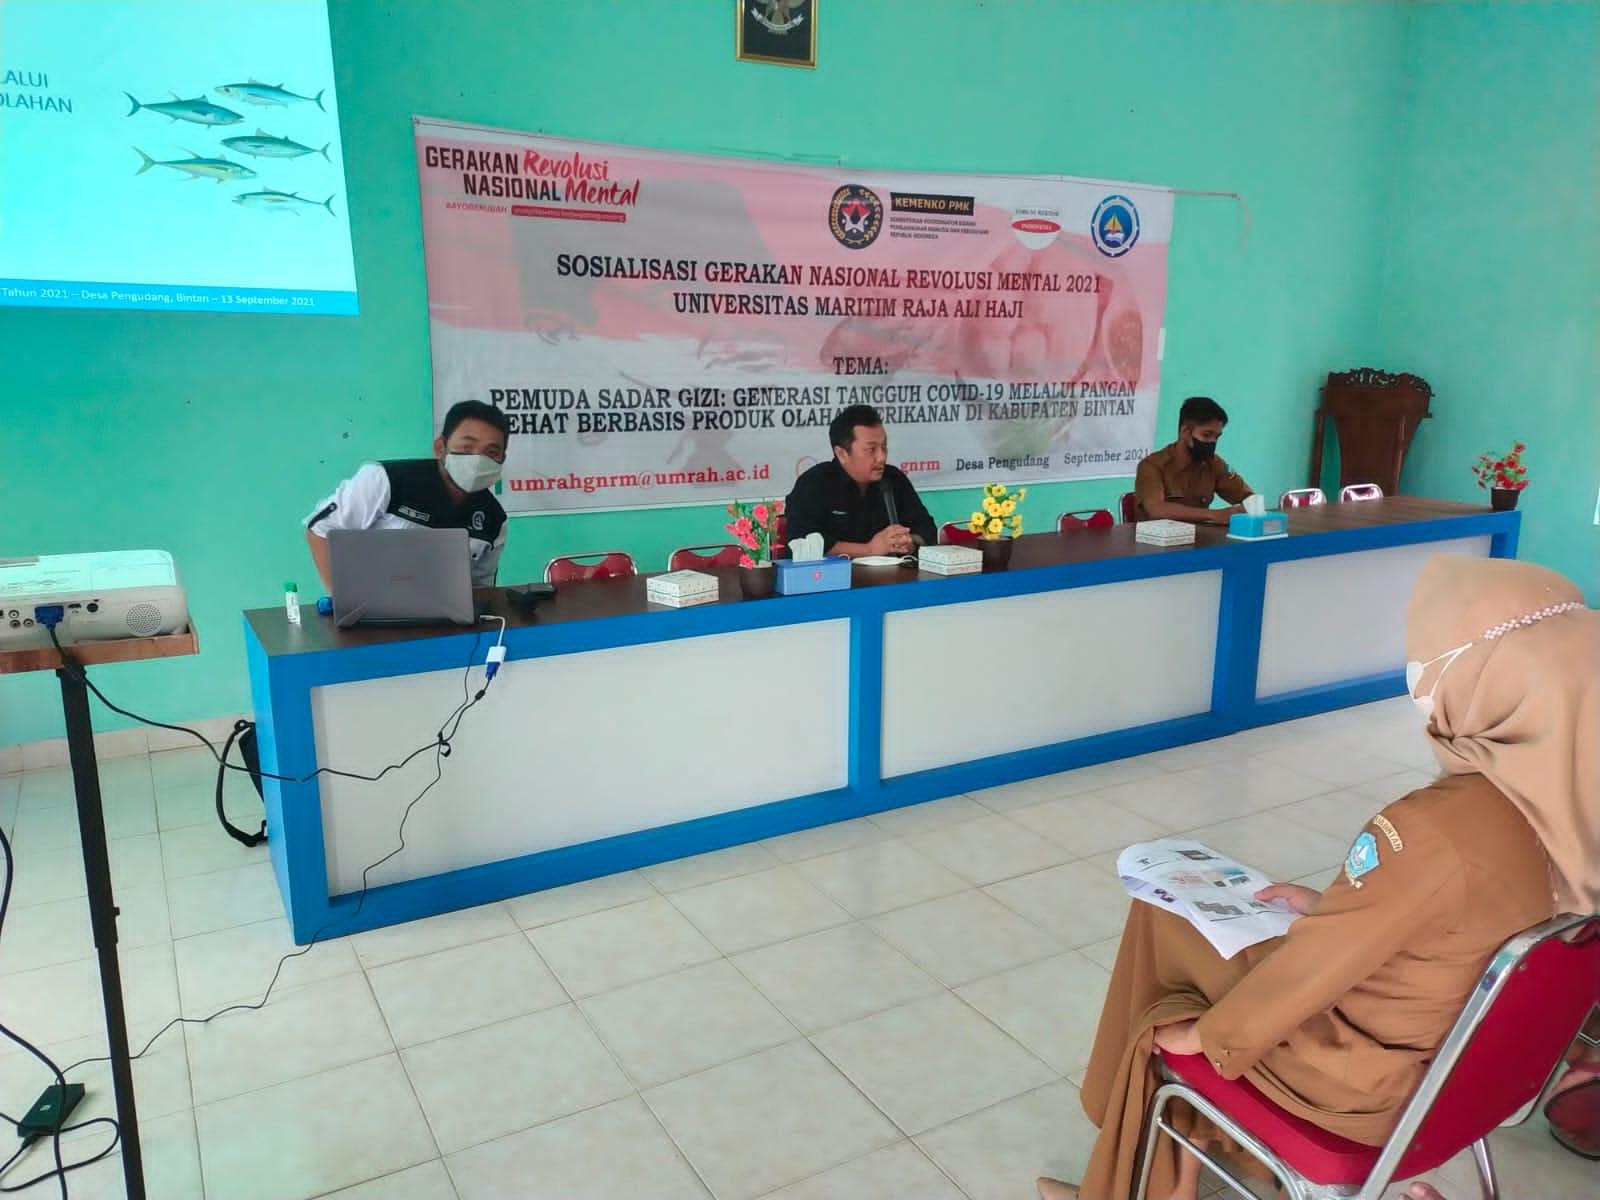 Pemaparan Oleh Rektor UMRAH,Prof. Dr. Agung Dhamar Syakti, S.Pi DEA